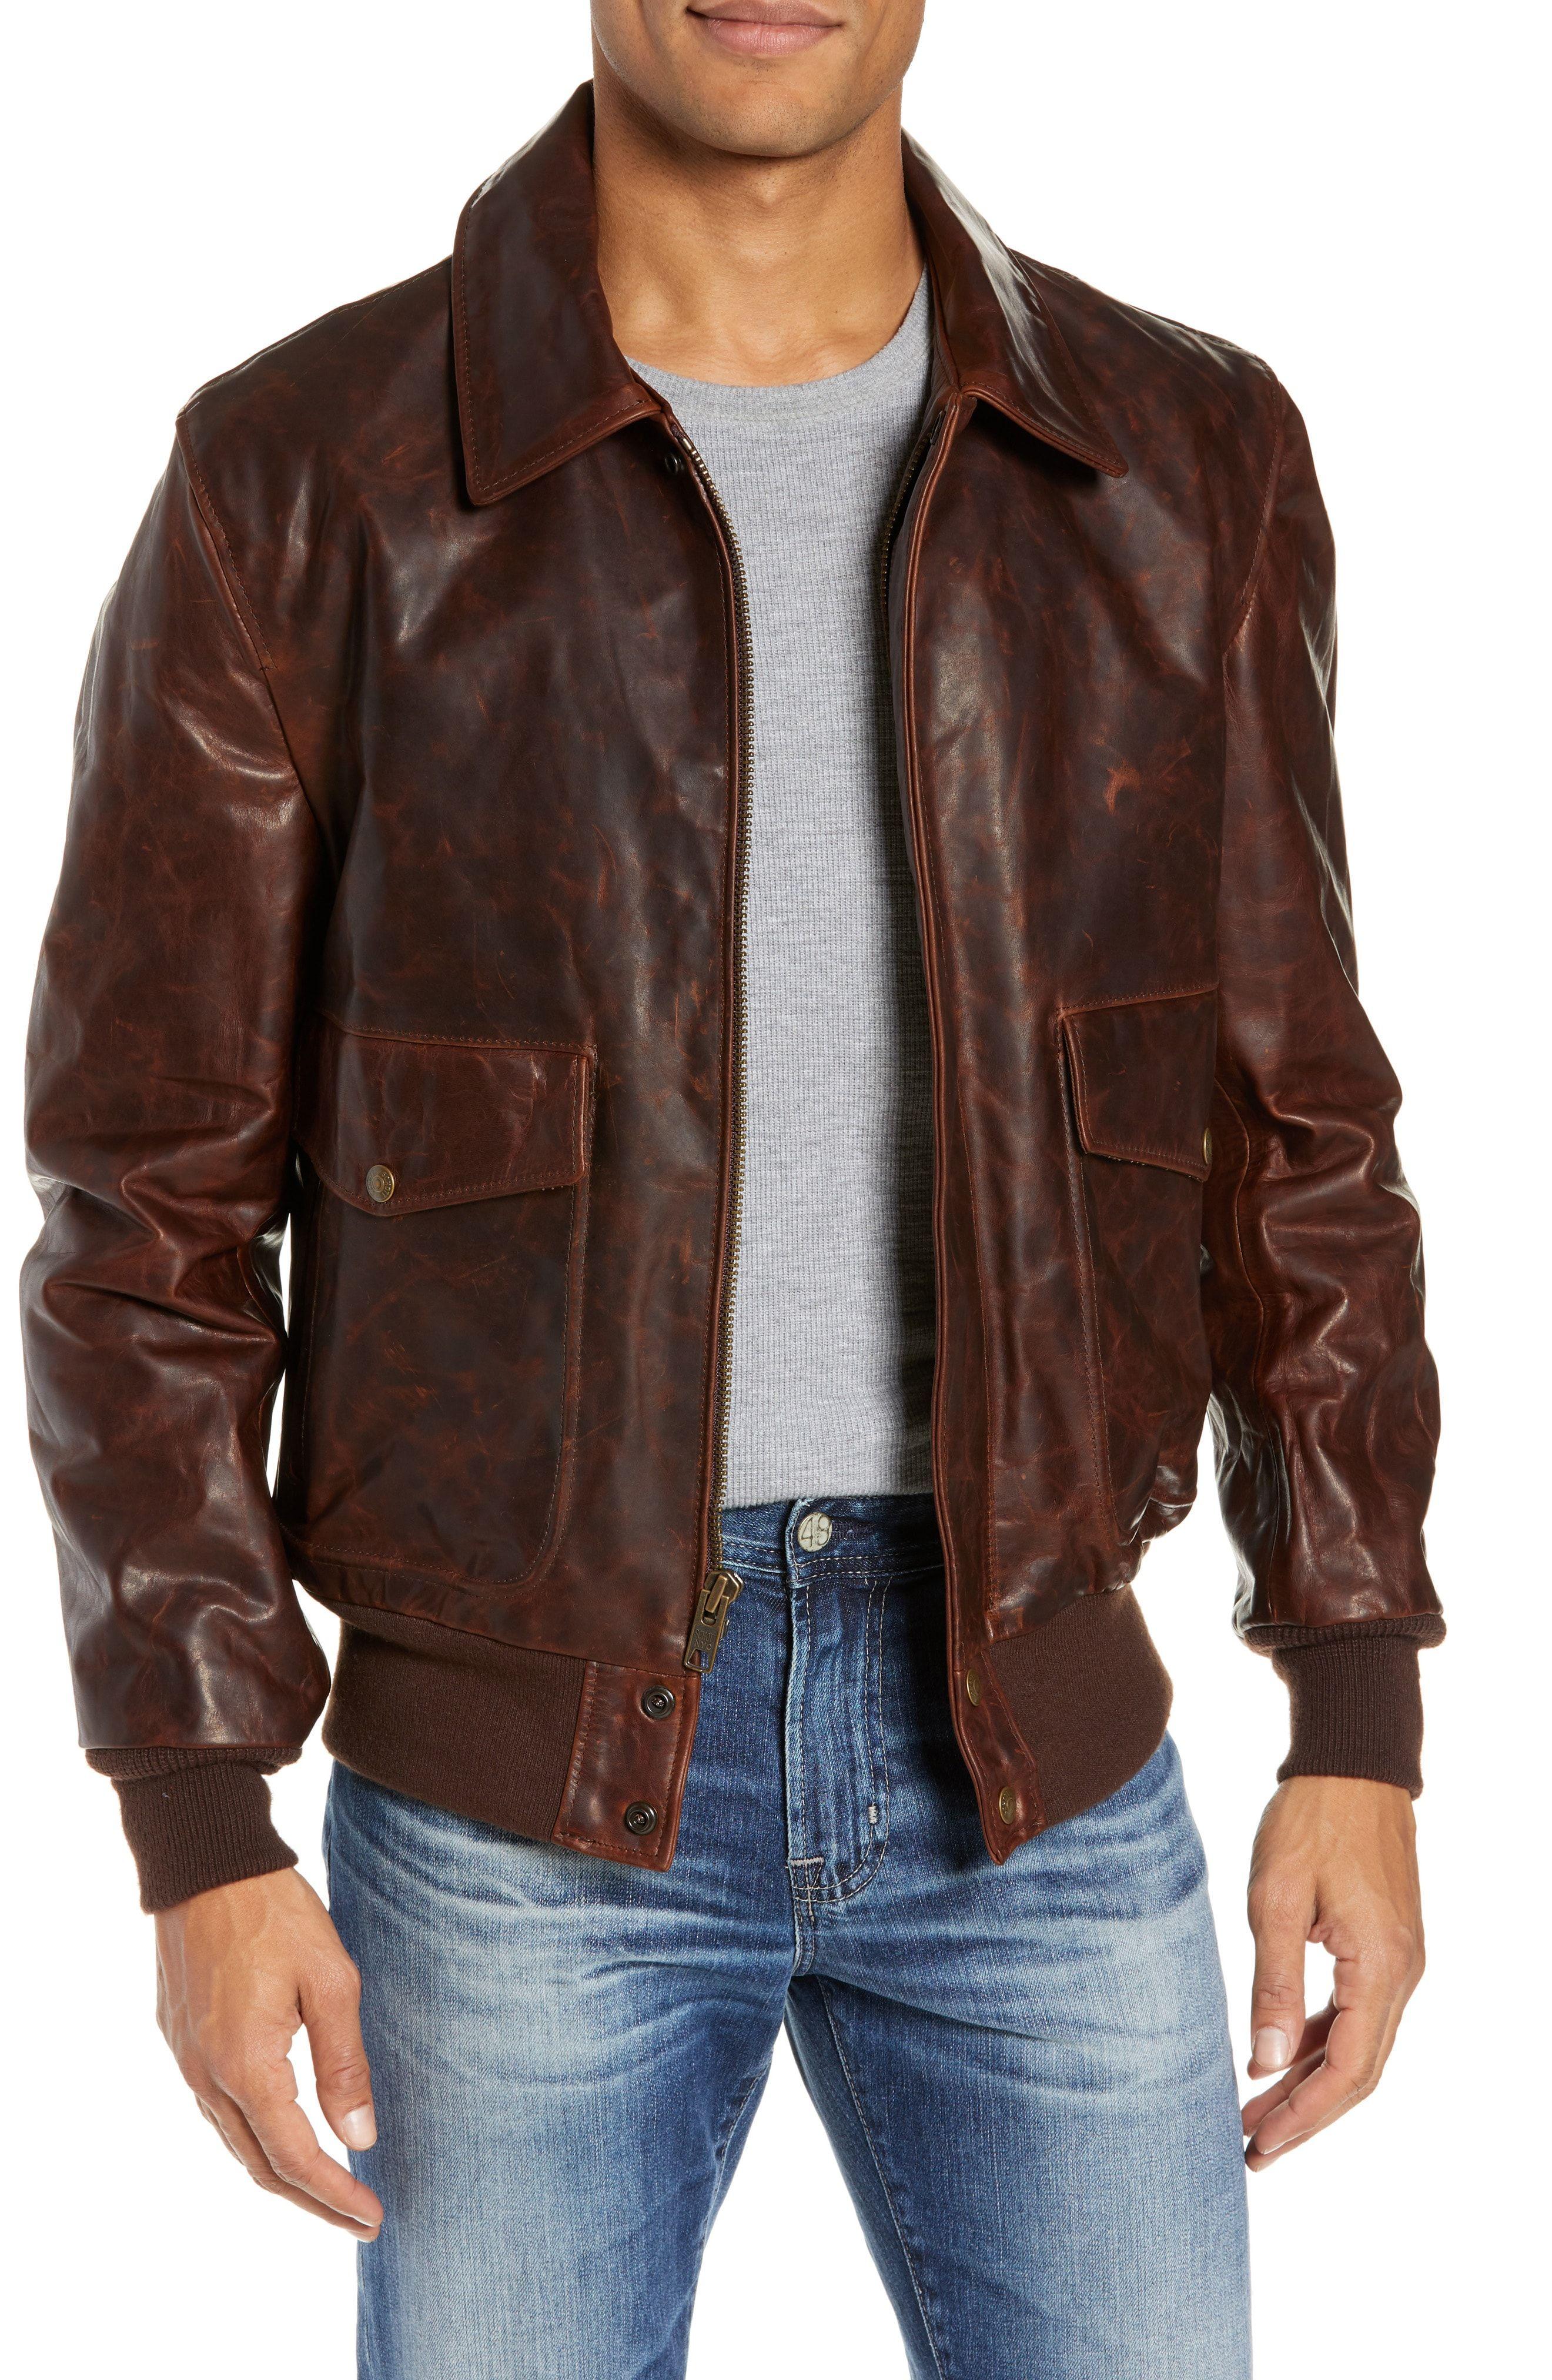 Vintage Coats Jackets Retro Coats And Jackets Leather Flight Jacket Leather Jacket Men Flight Jacket [ 4048 x 2640 Pixel ]